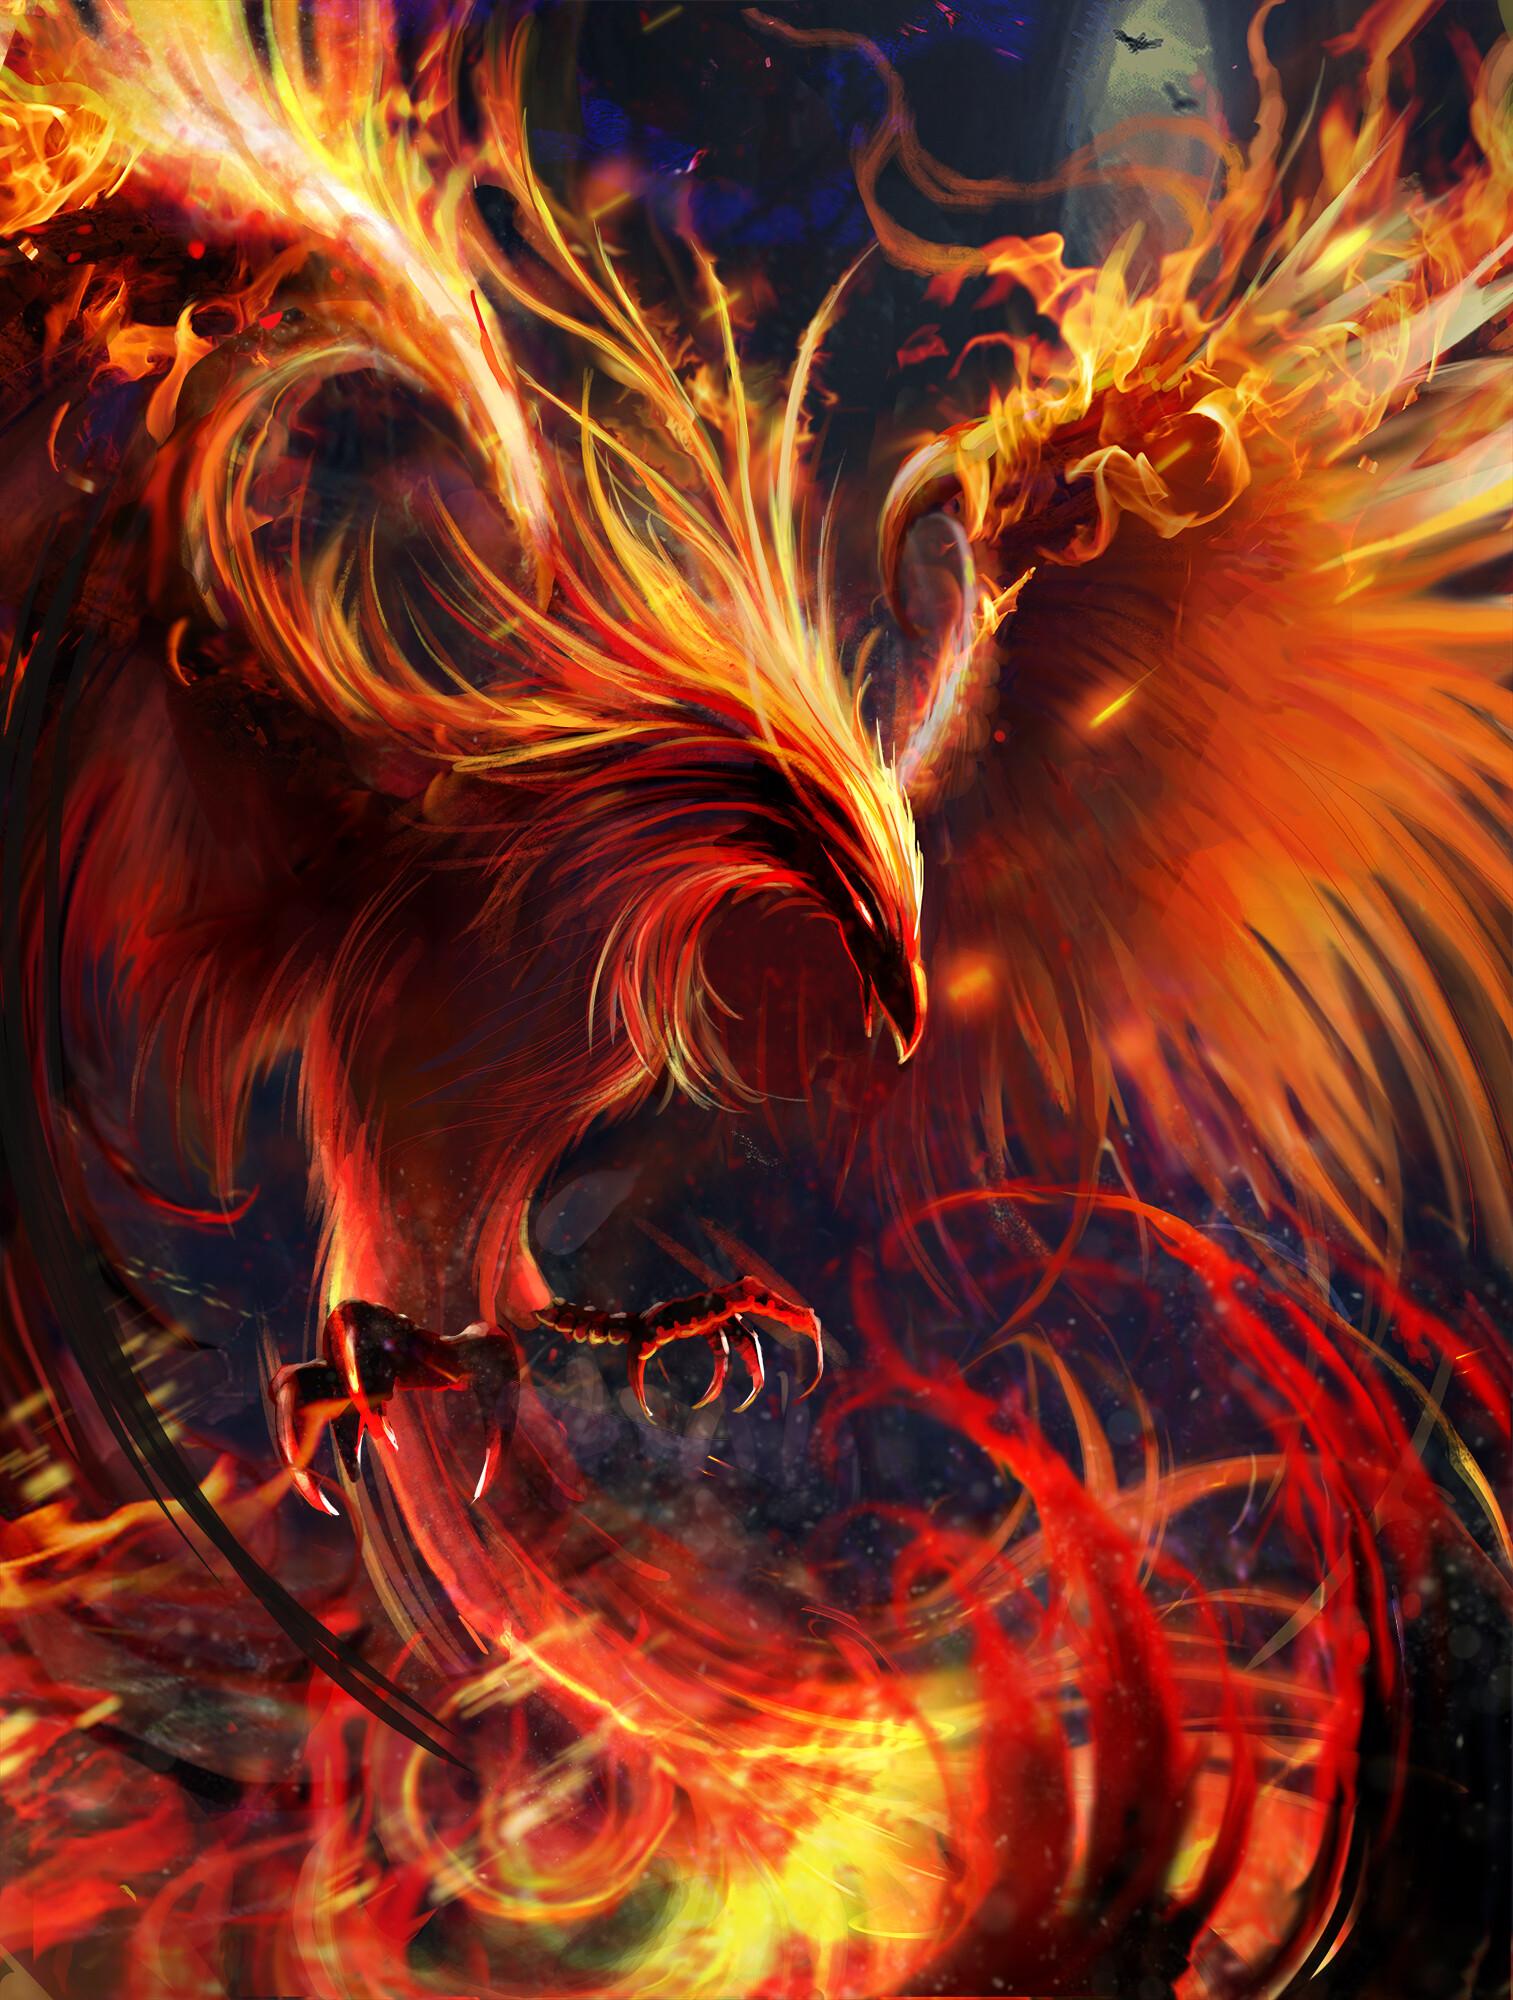 Phoenix by lana g